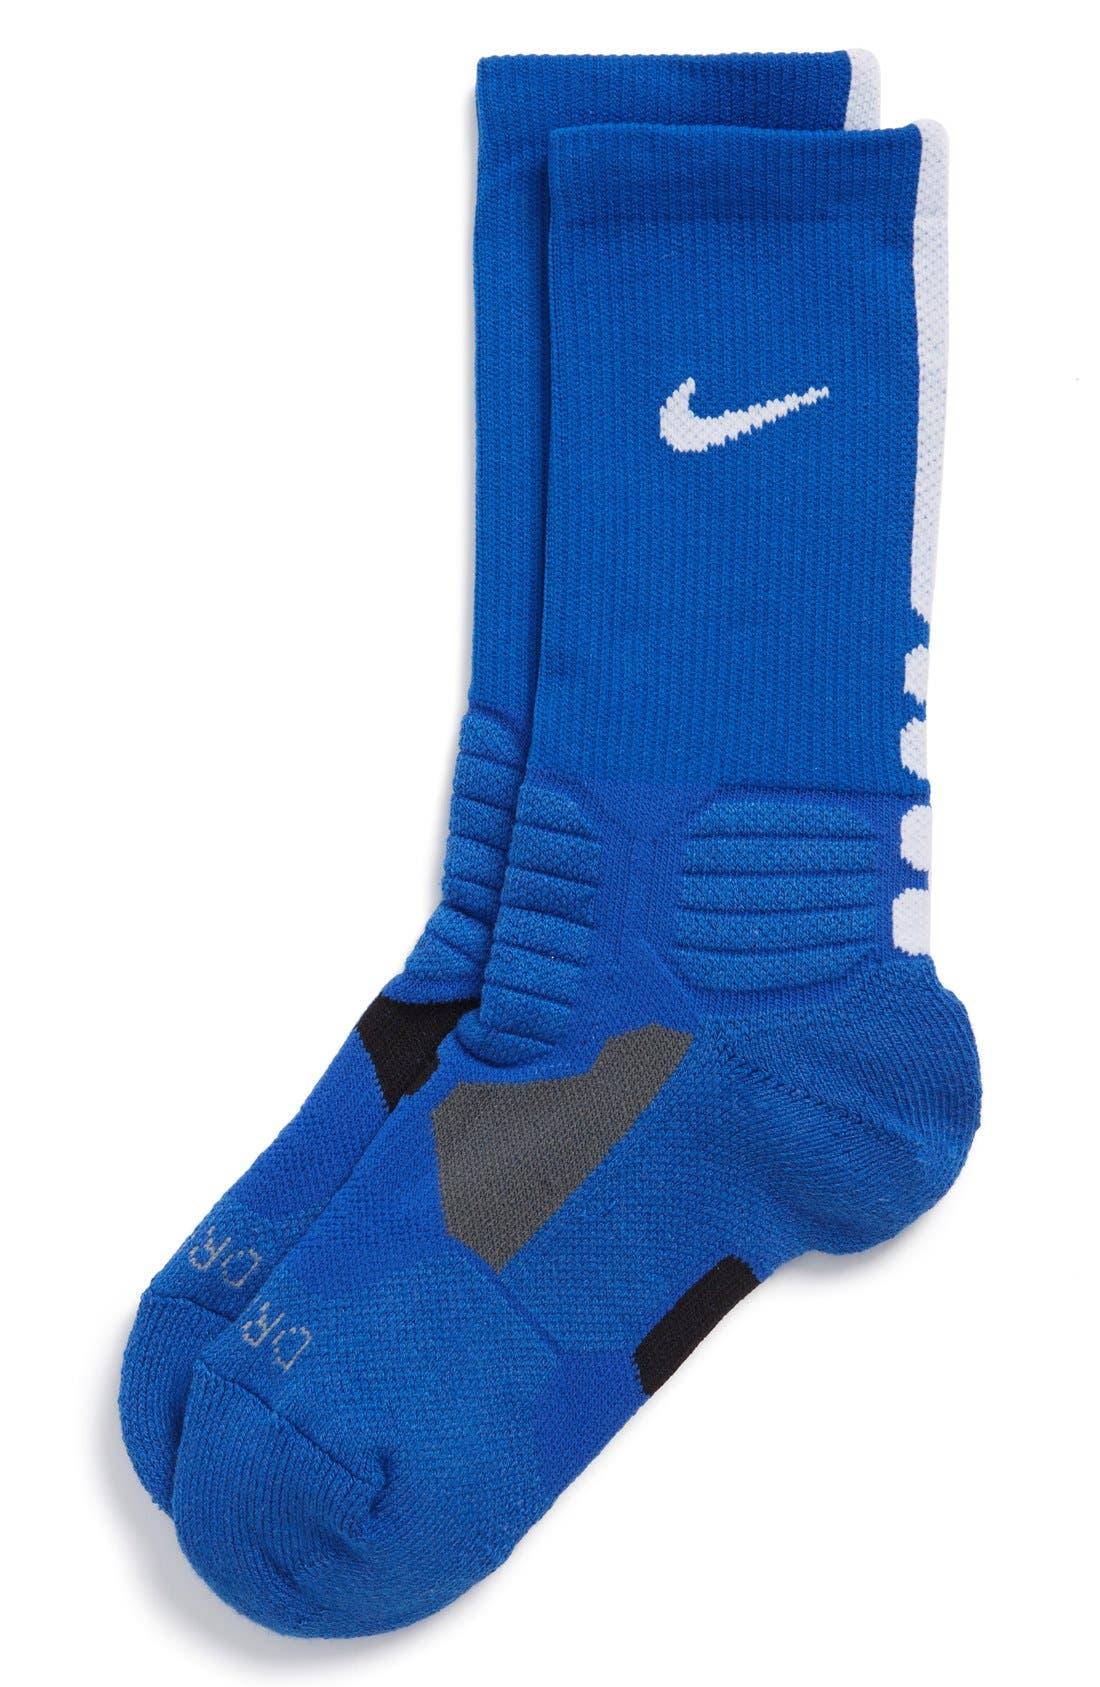 Alternate Image 1 Selected - Nike 'Hyper Elite' Dri-FIT Basketball Socks (Big Kid)